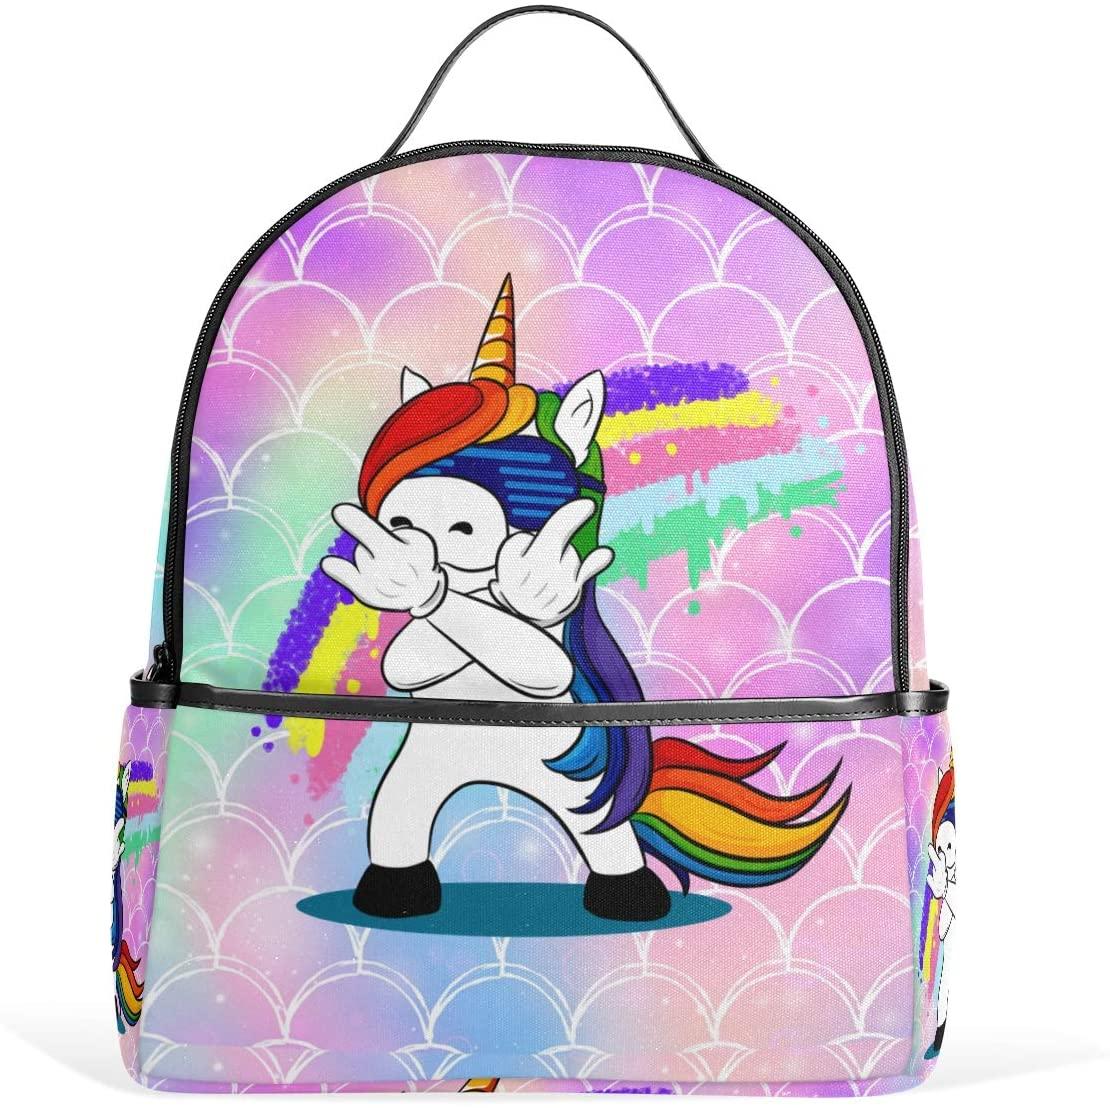 Kids' School Backpack Rock Unicorn Rainbow Galaxy Mermaid Scales Bookbag for Boys Girls Lightweight Casual Travel Bag Large Capacity Daypack